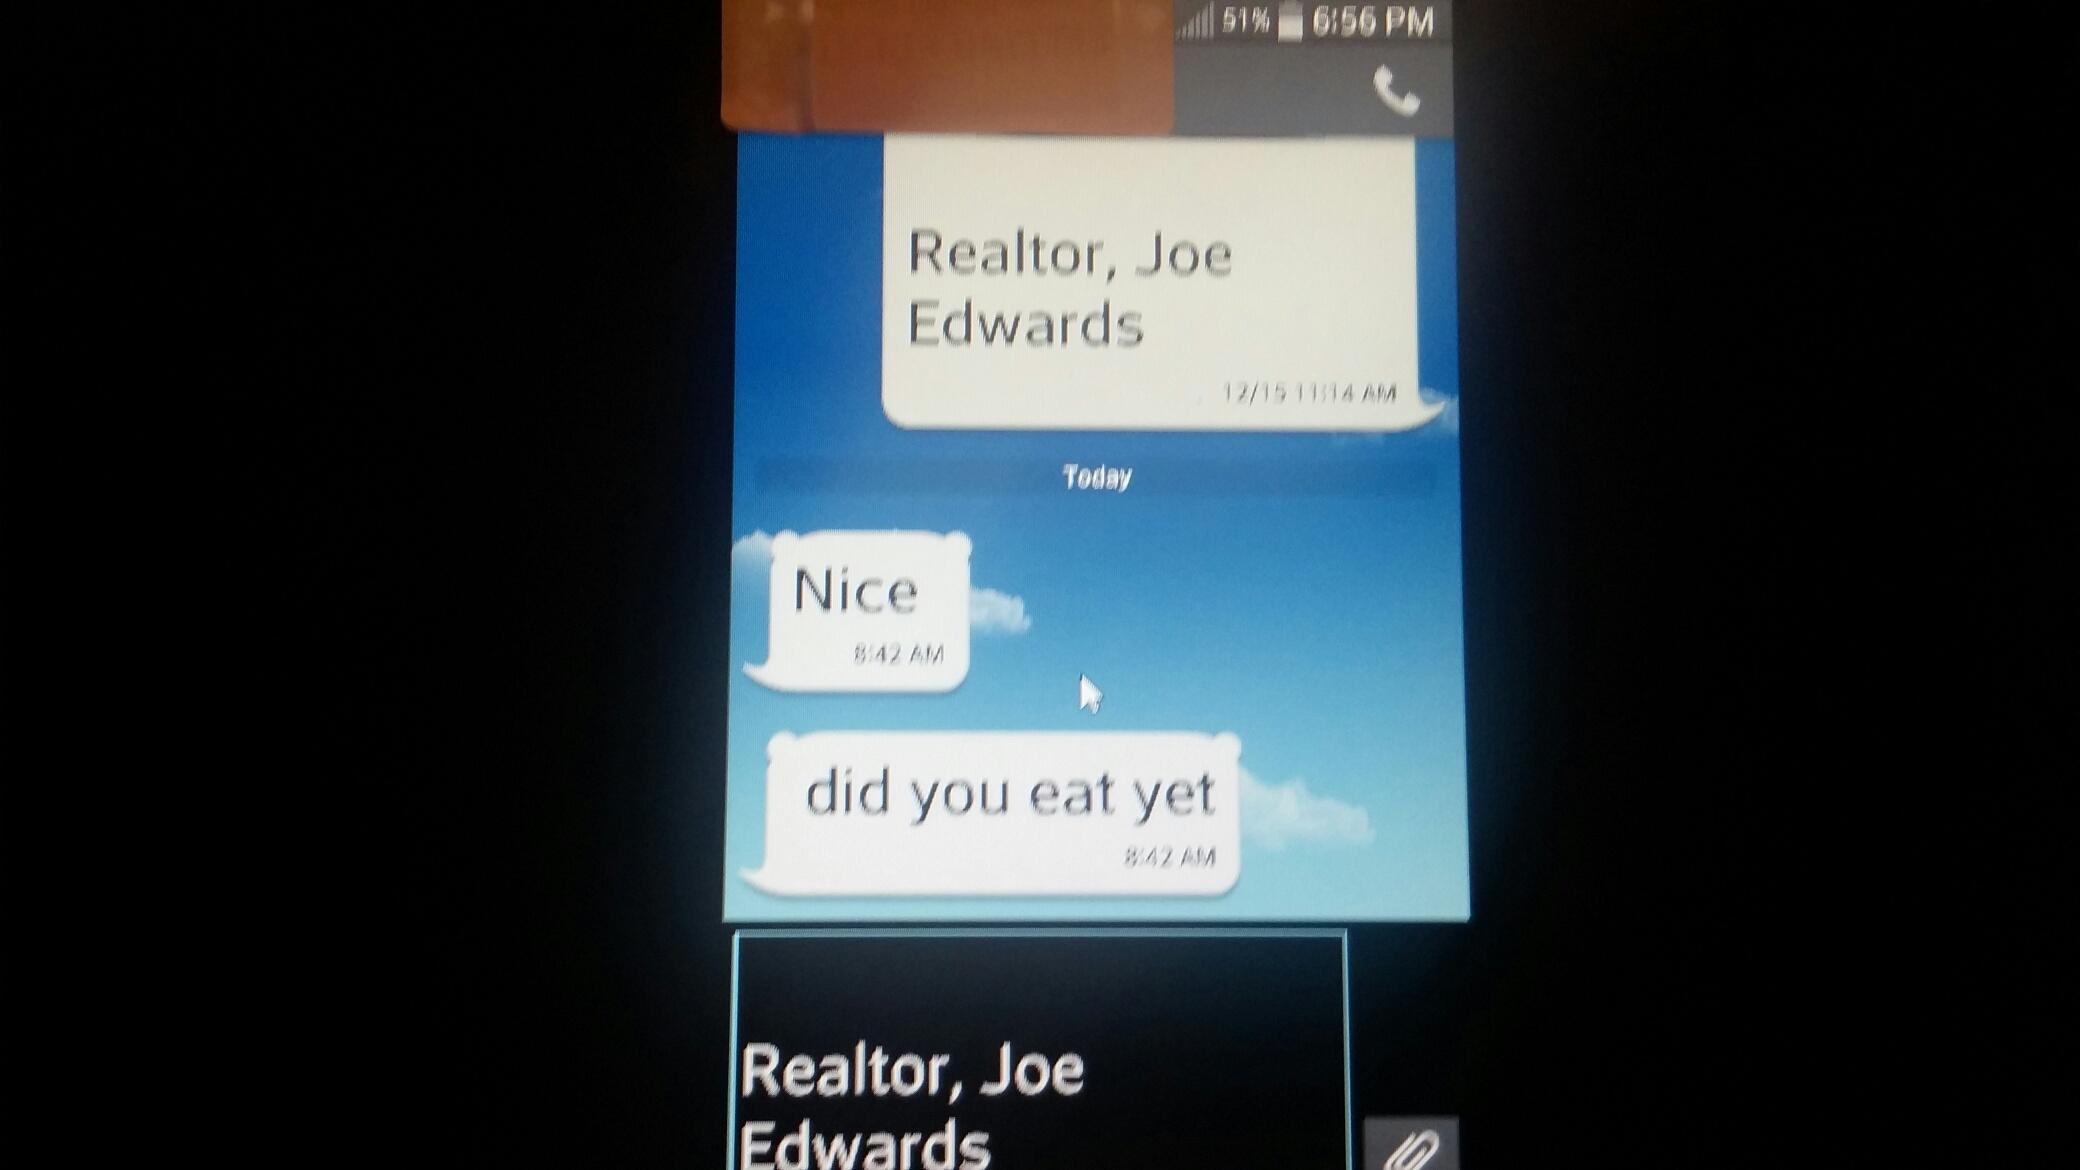 1 annoying text